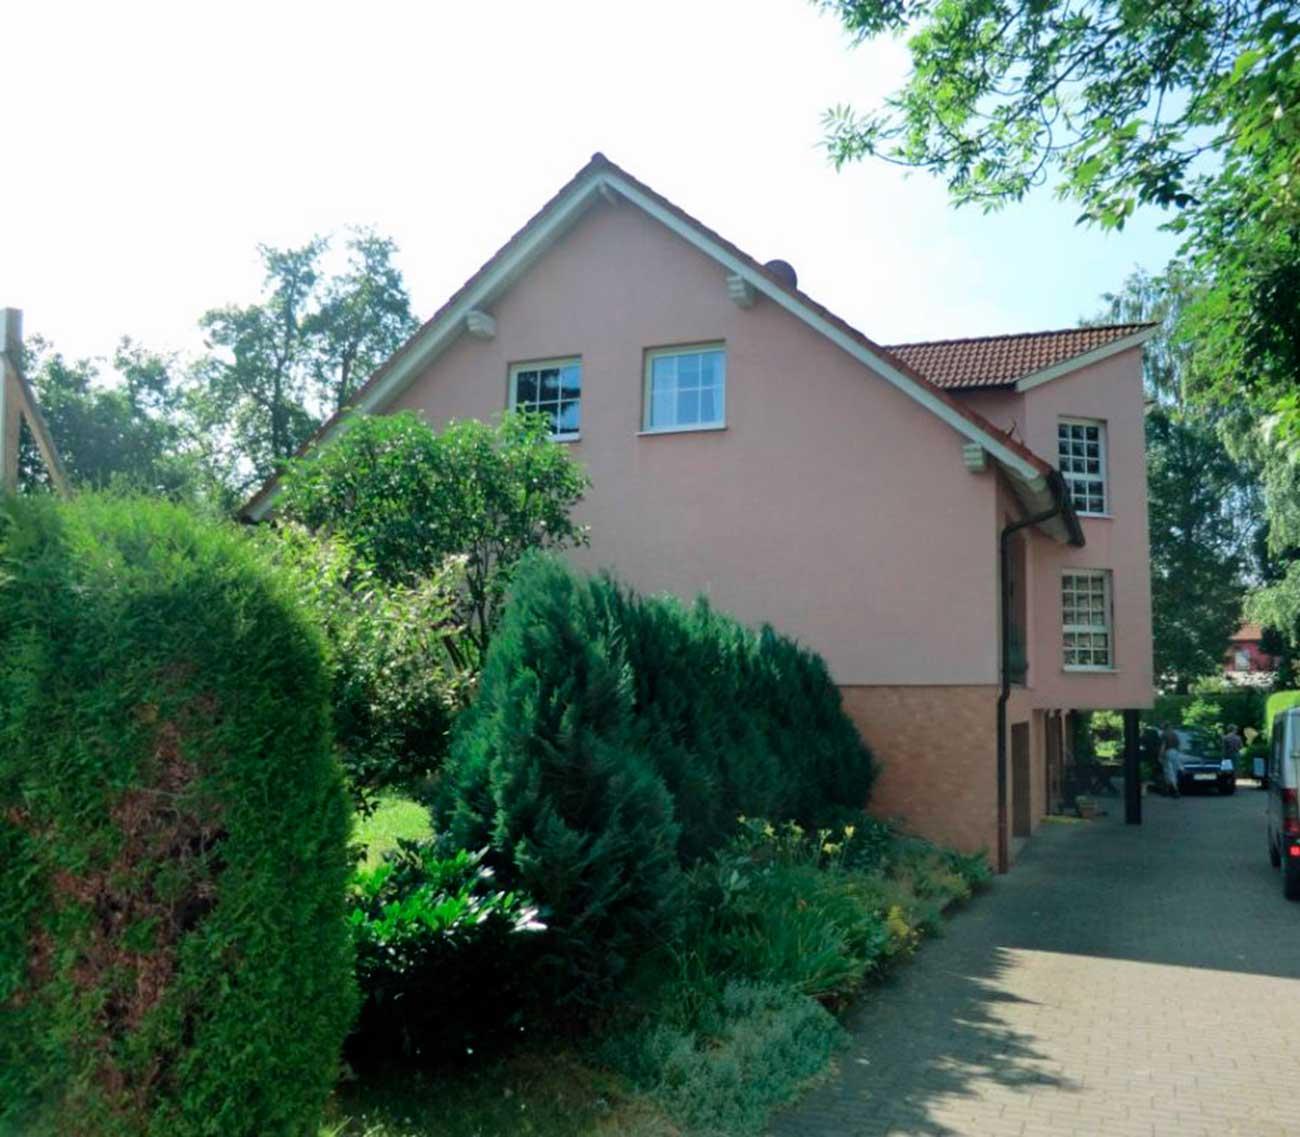 Mehrfamilienhaus Montabaur Mehrfamilienhäuser Mieten Kaufen: Mieten Kaufen Doppelhaushälfte In Sonneborn